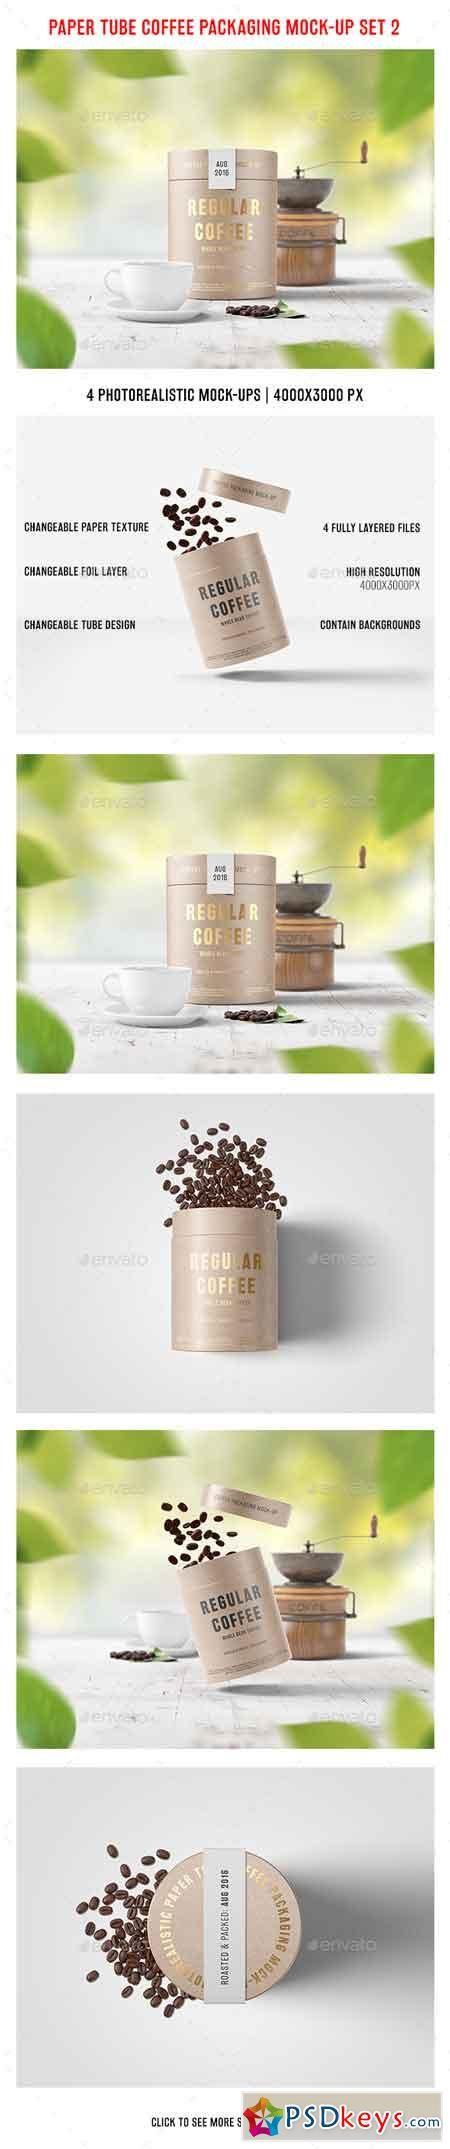 Paper Tube Coffee Packaging Mock-Up Set 2 17693579